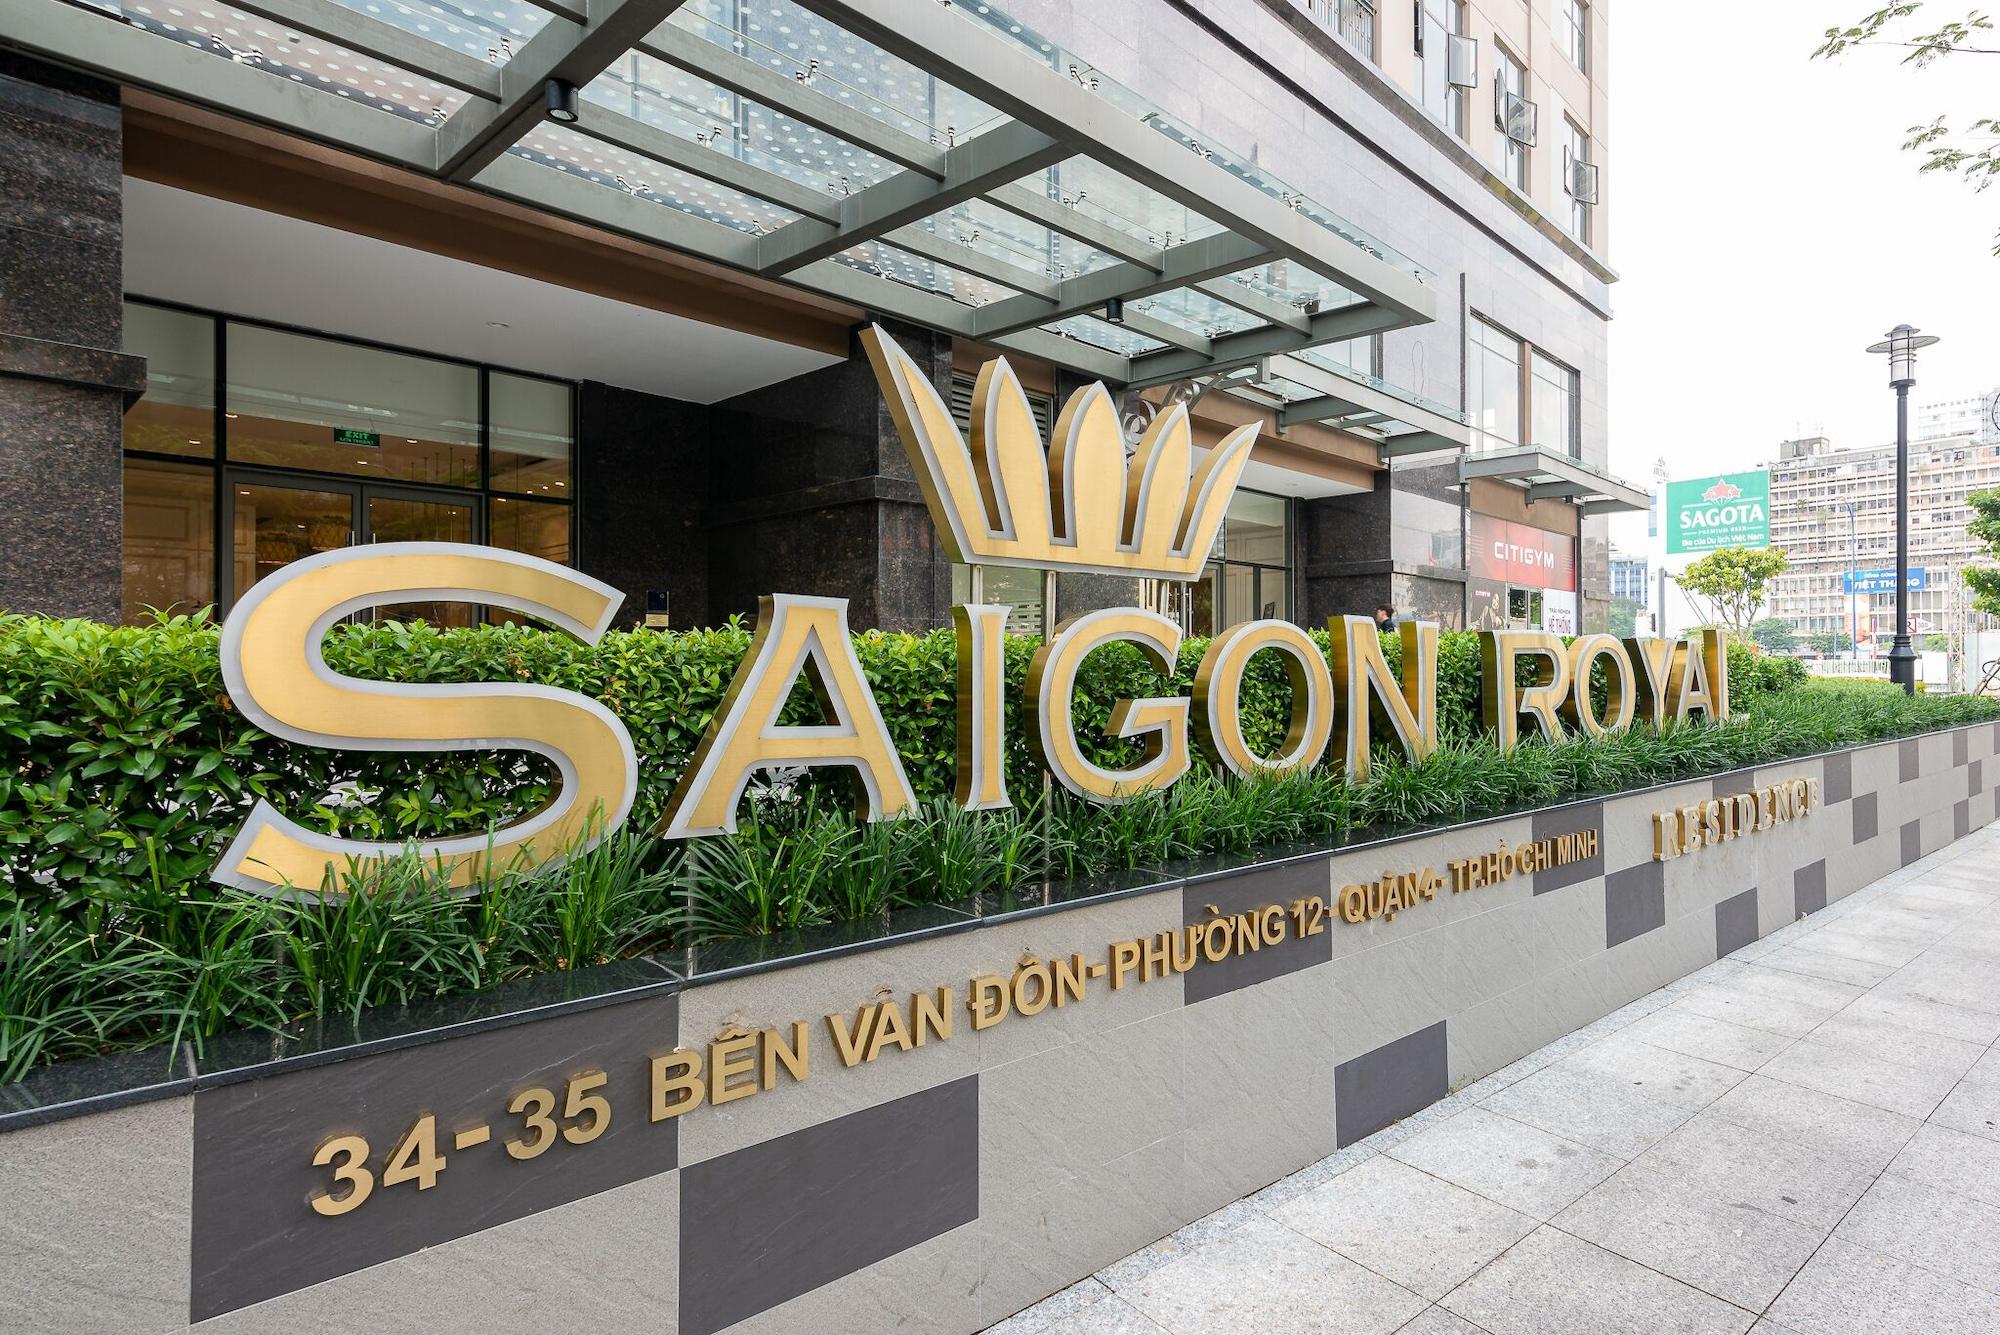 Saigon Royal - Melody Apartment, Quận 4